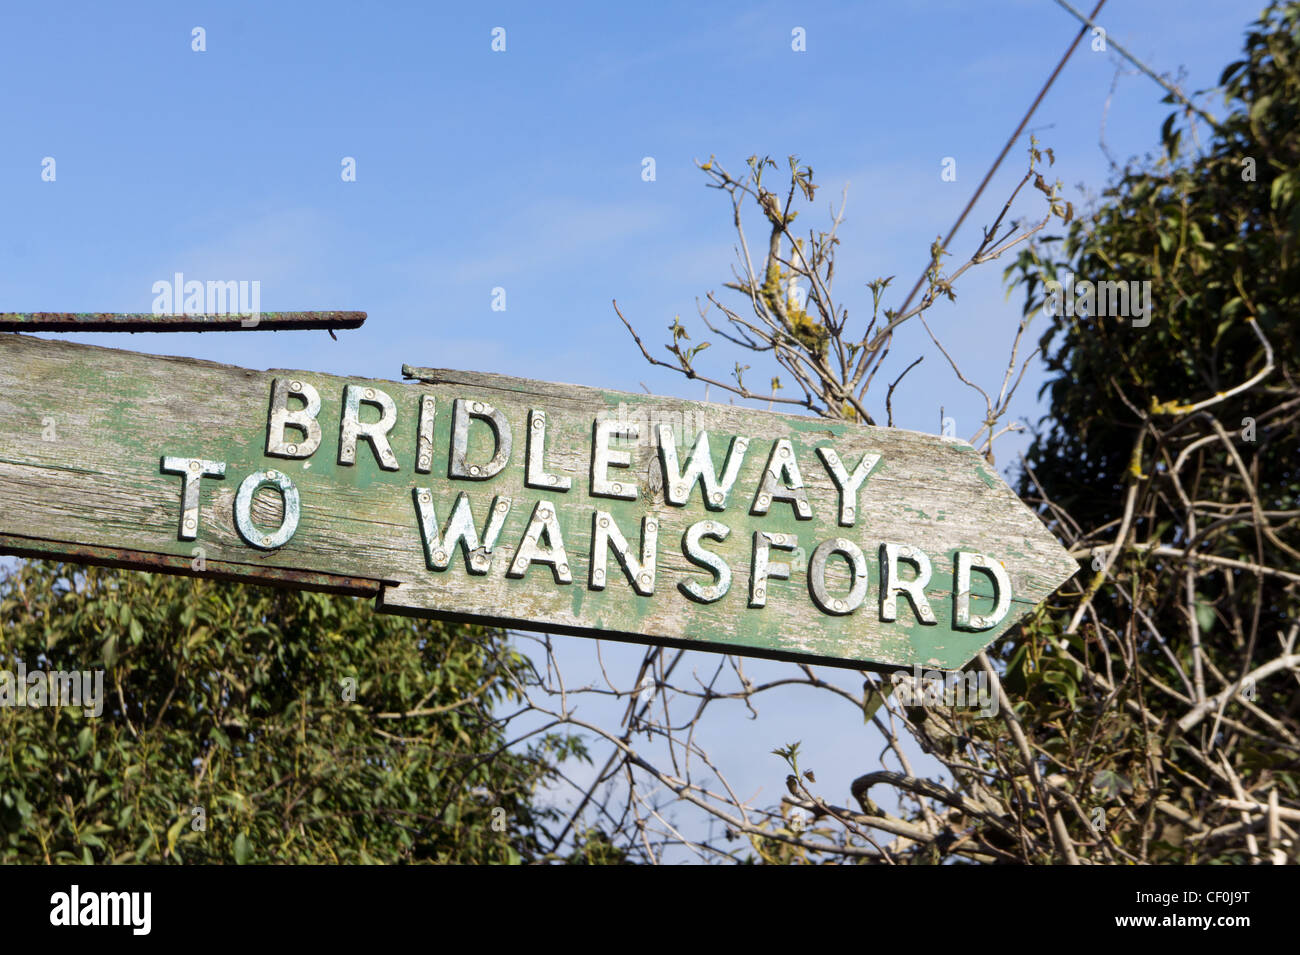 Bridleway to Wansford sign, Northamptonshire, England. - Stock Image